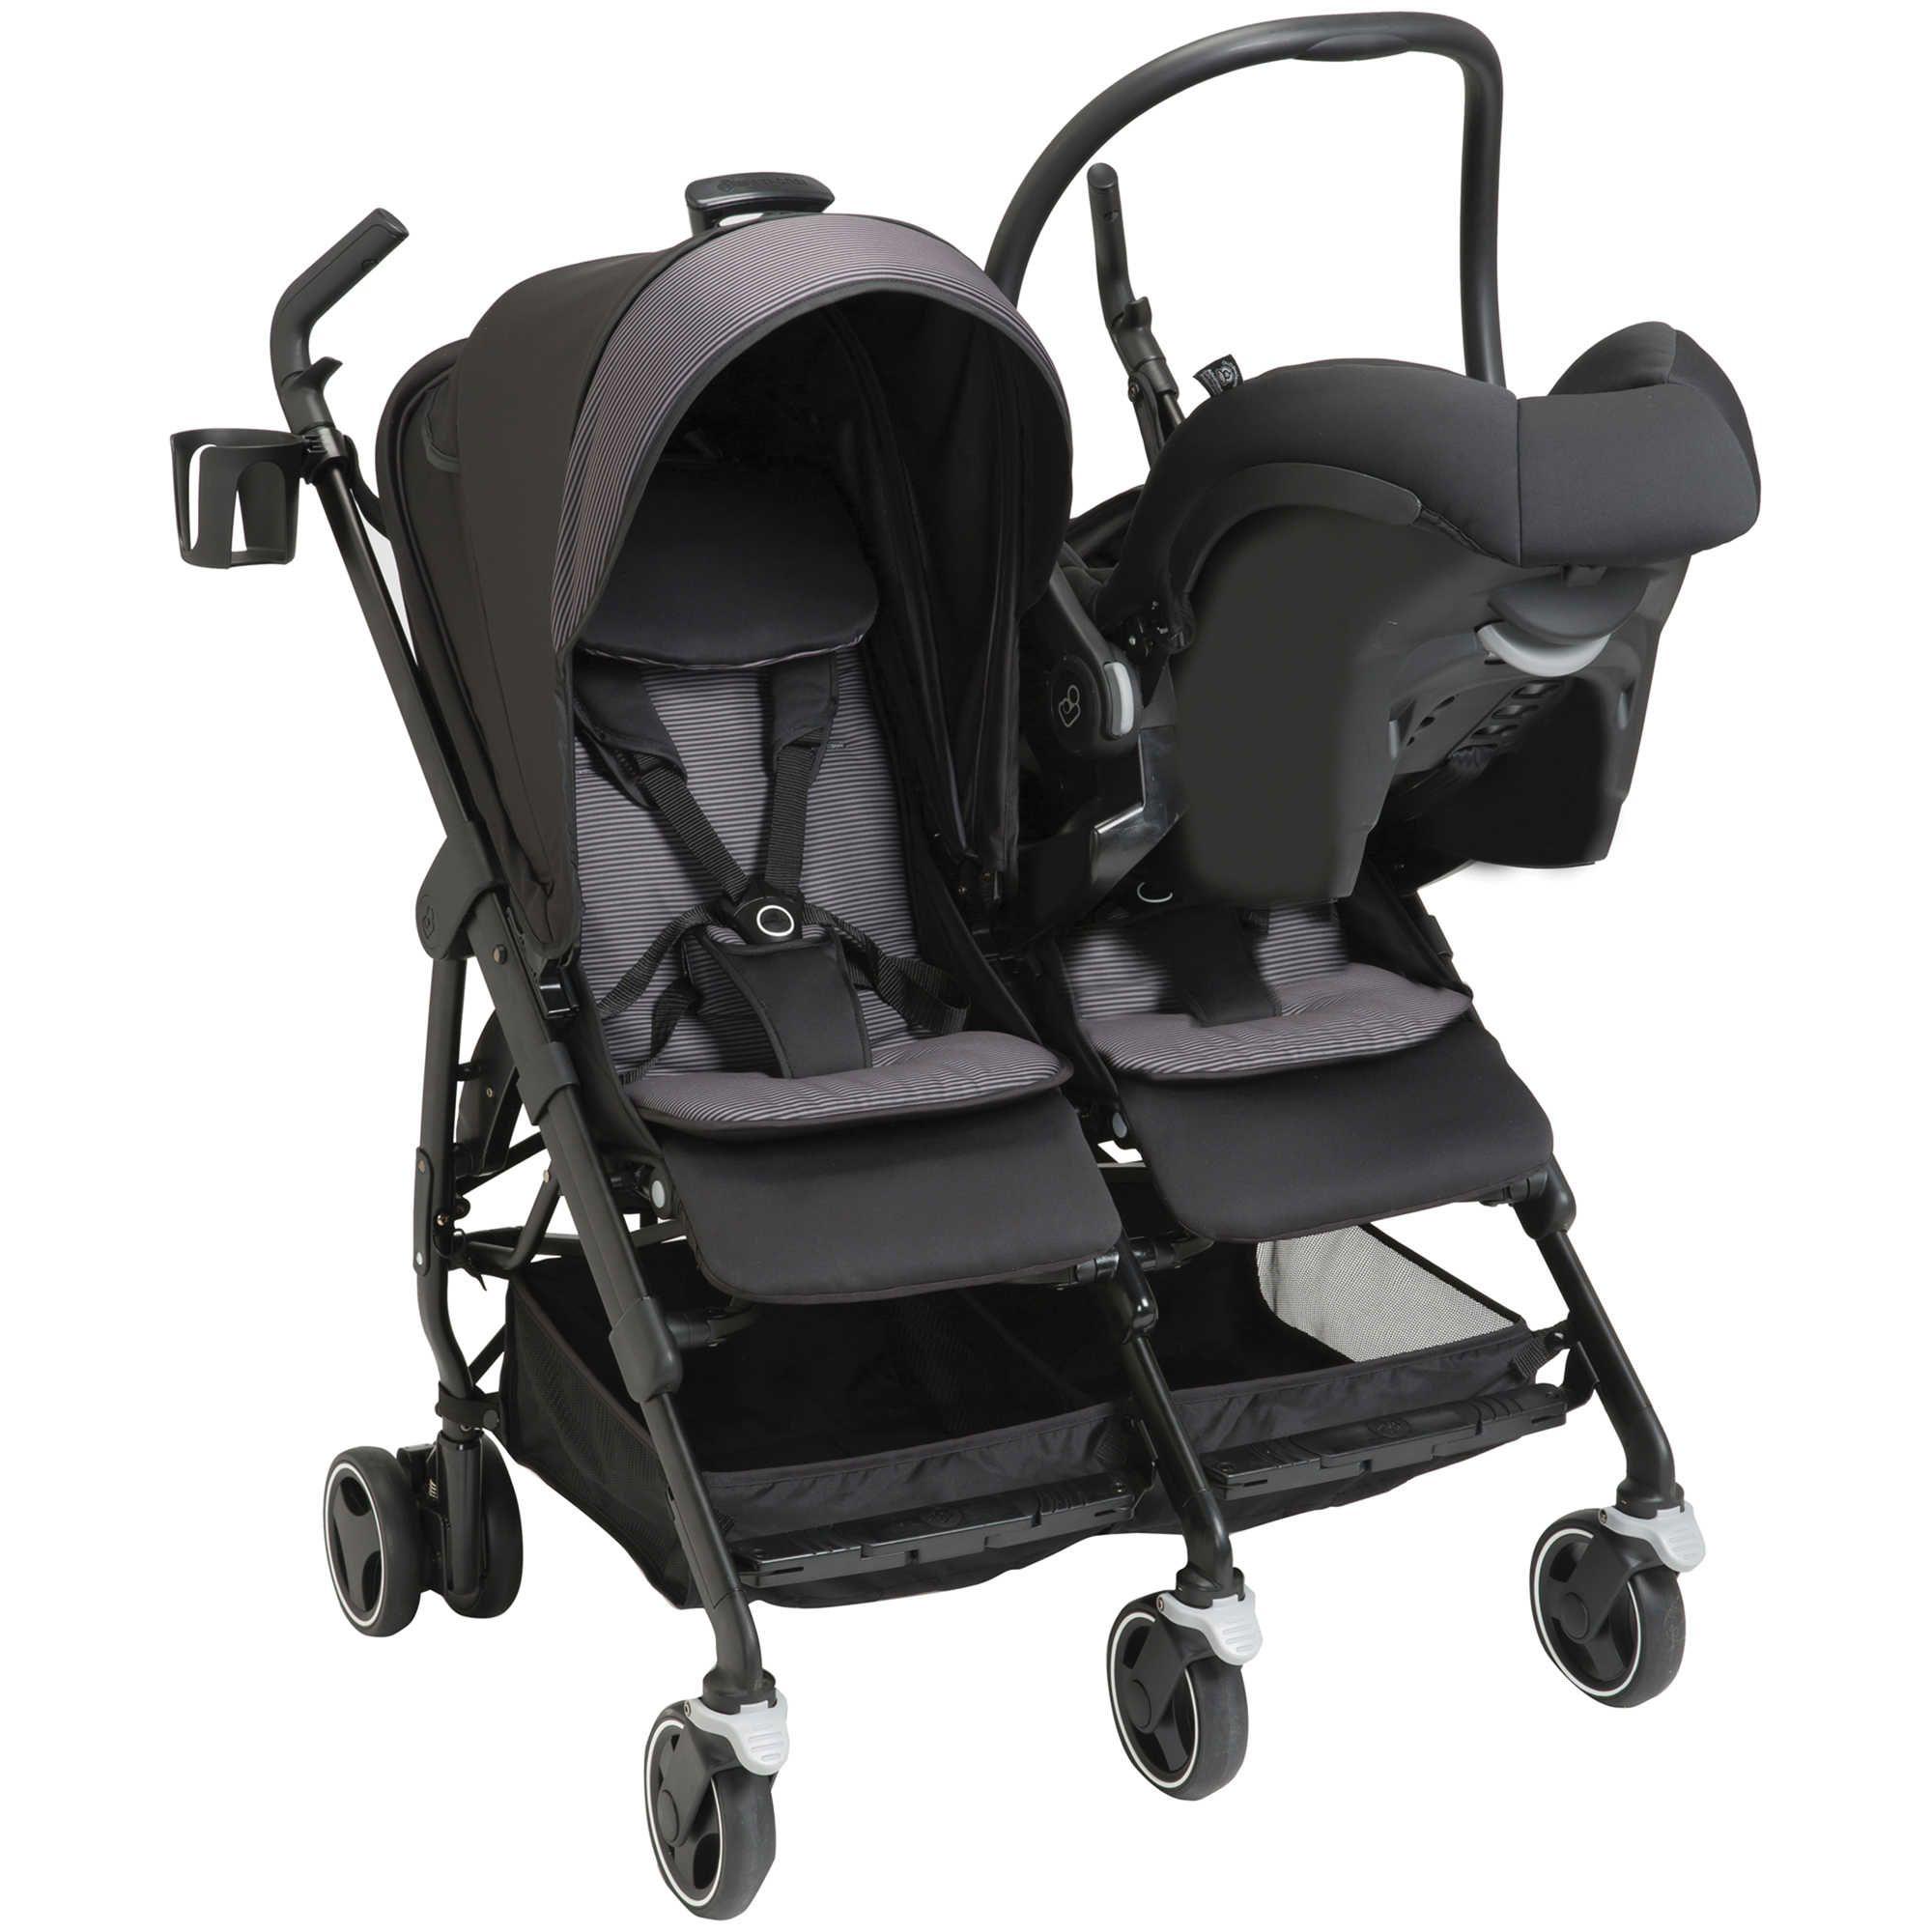 MaxiCosi® Dana For2 Double Stroller in Devoted Black 400